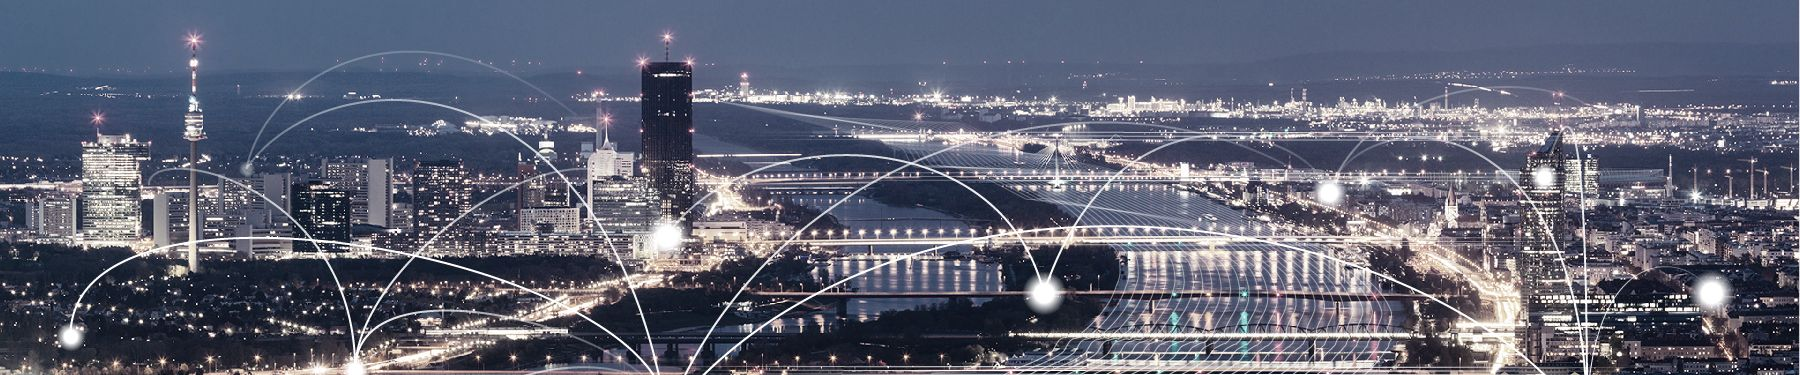 Vienna skyline night